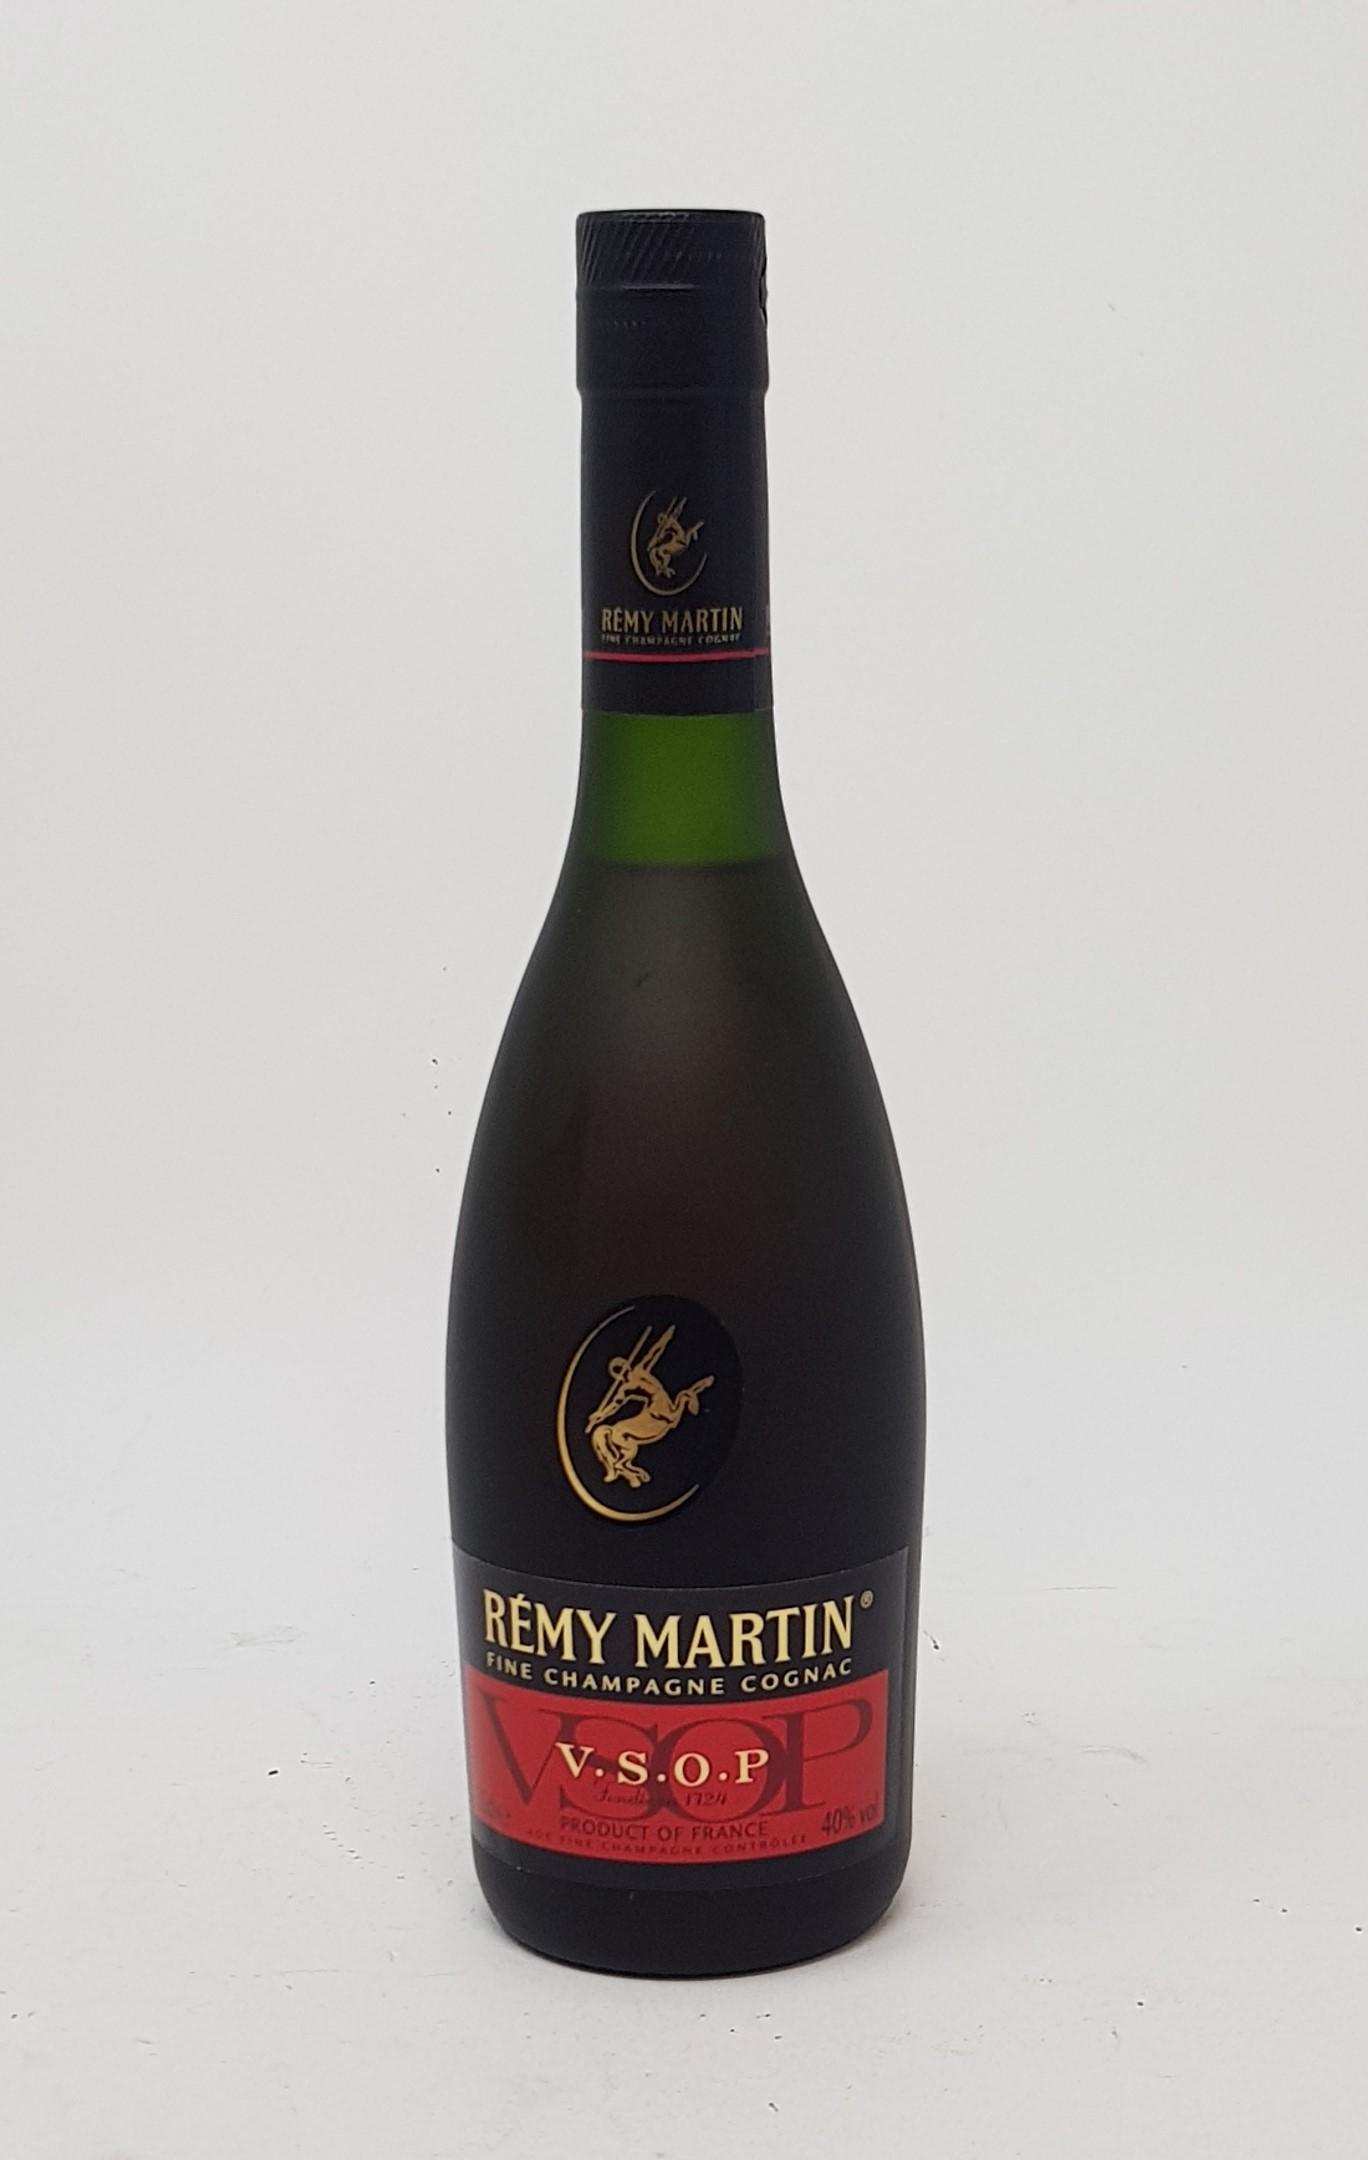 A 70cl bottle of Belle Vue Armagnac, a 350ml bottle of Remy Martin cognac, and a 70cl bottle of - Image 3 of 4